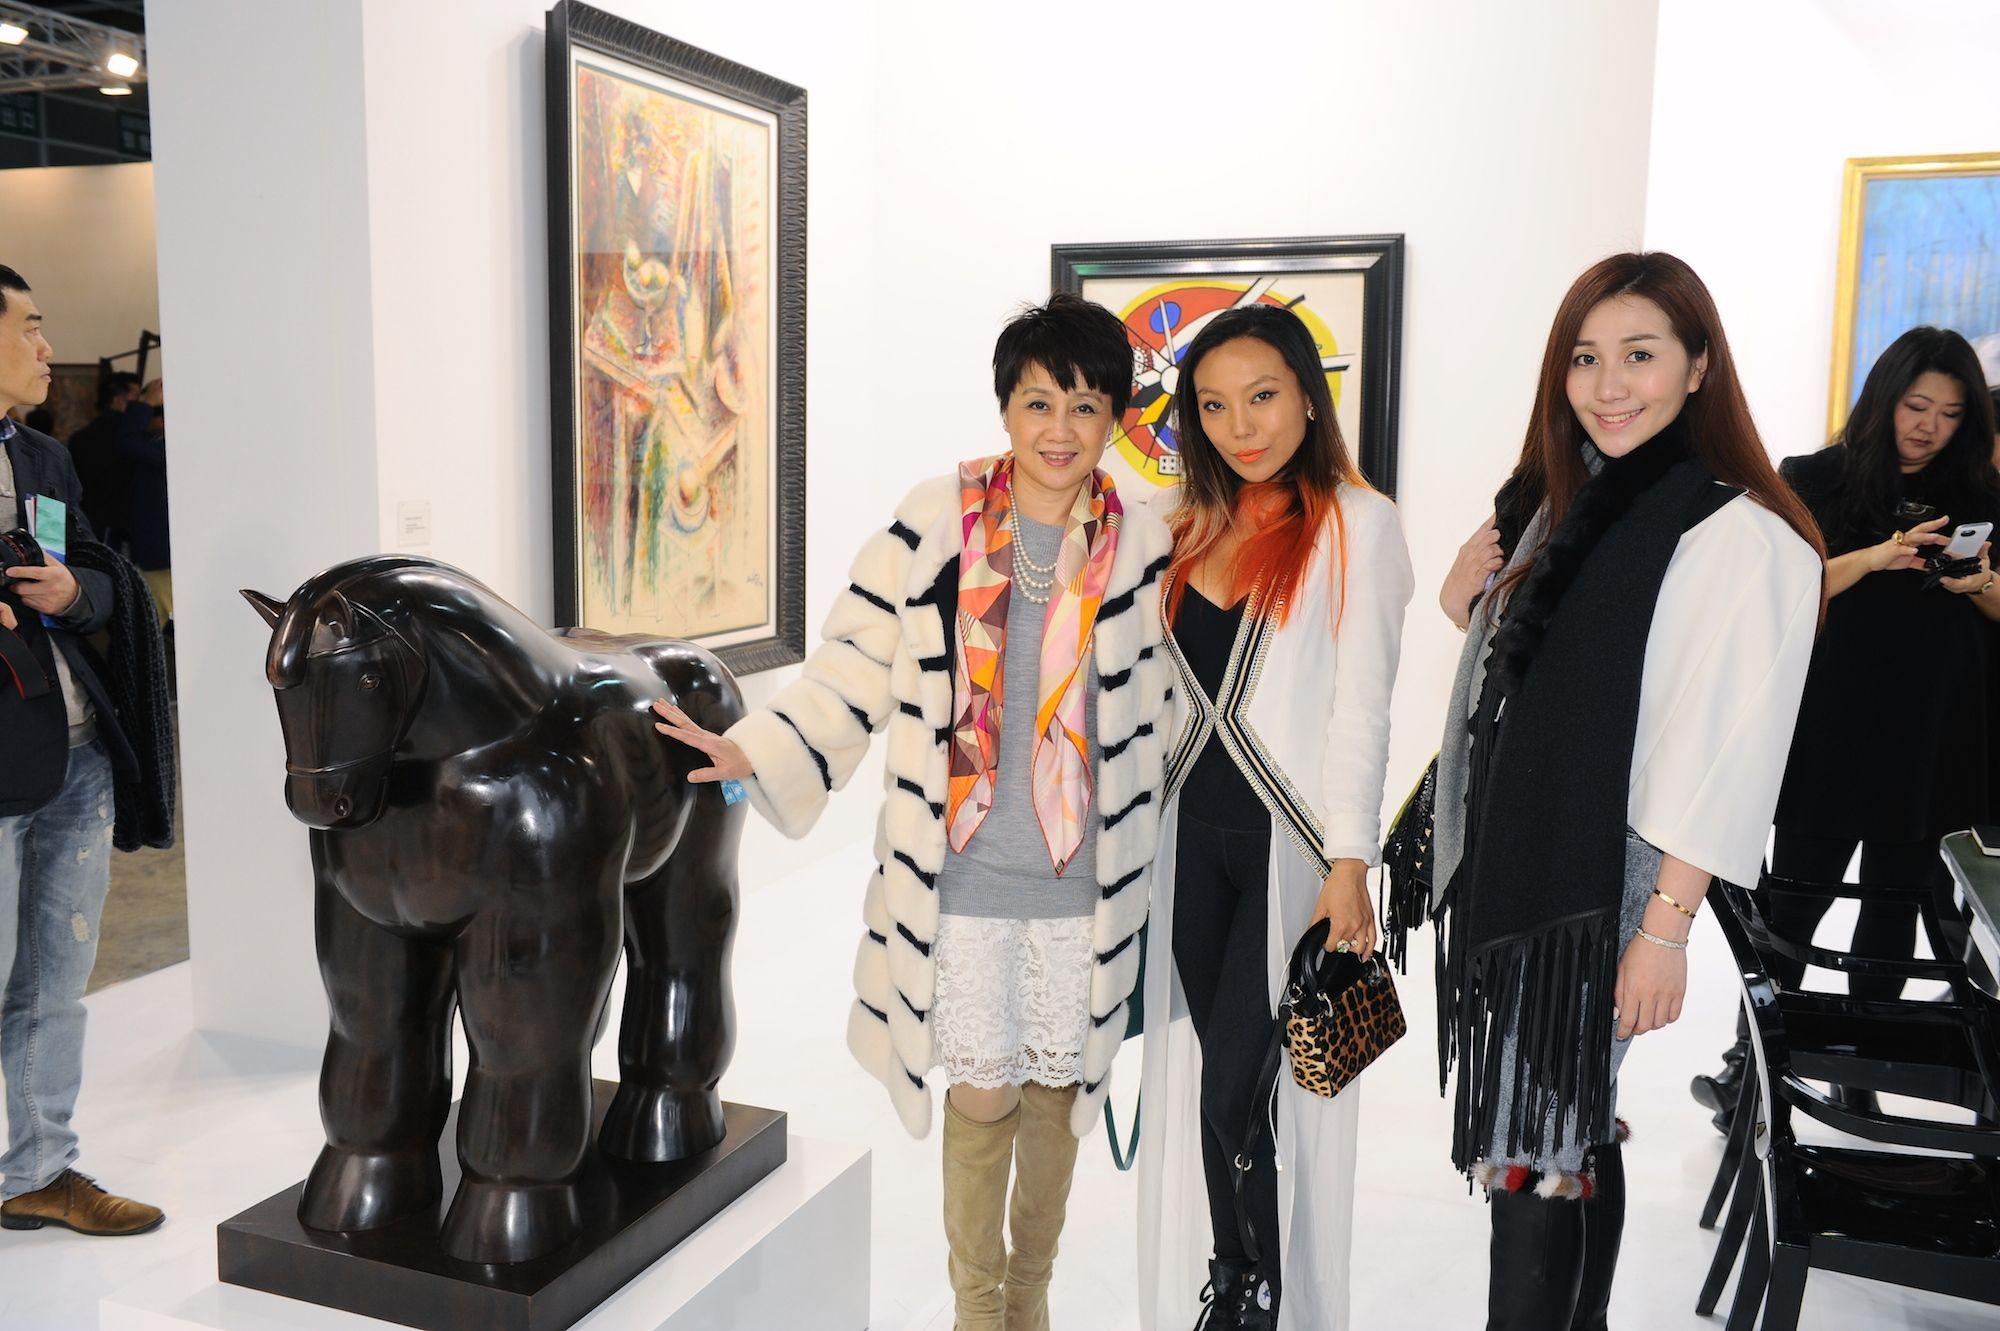 Angela Leong, Bao Bao Wan and Sabrina Ho